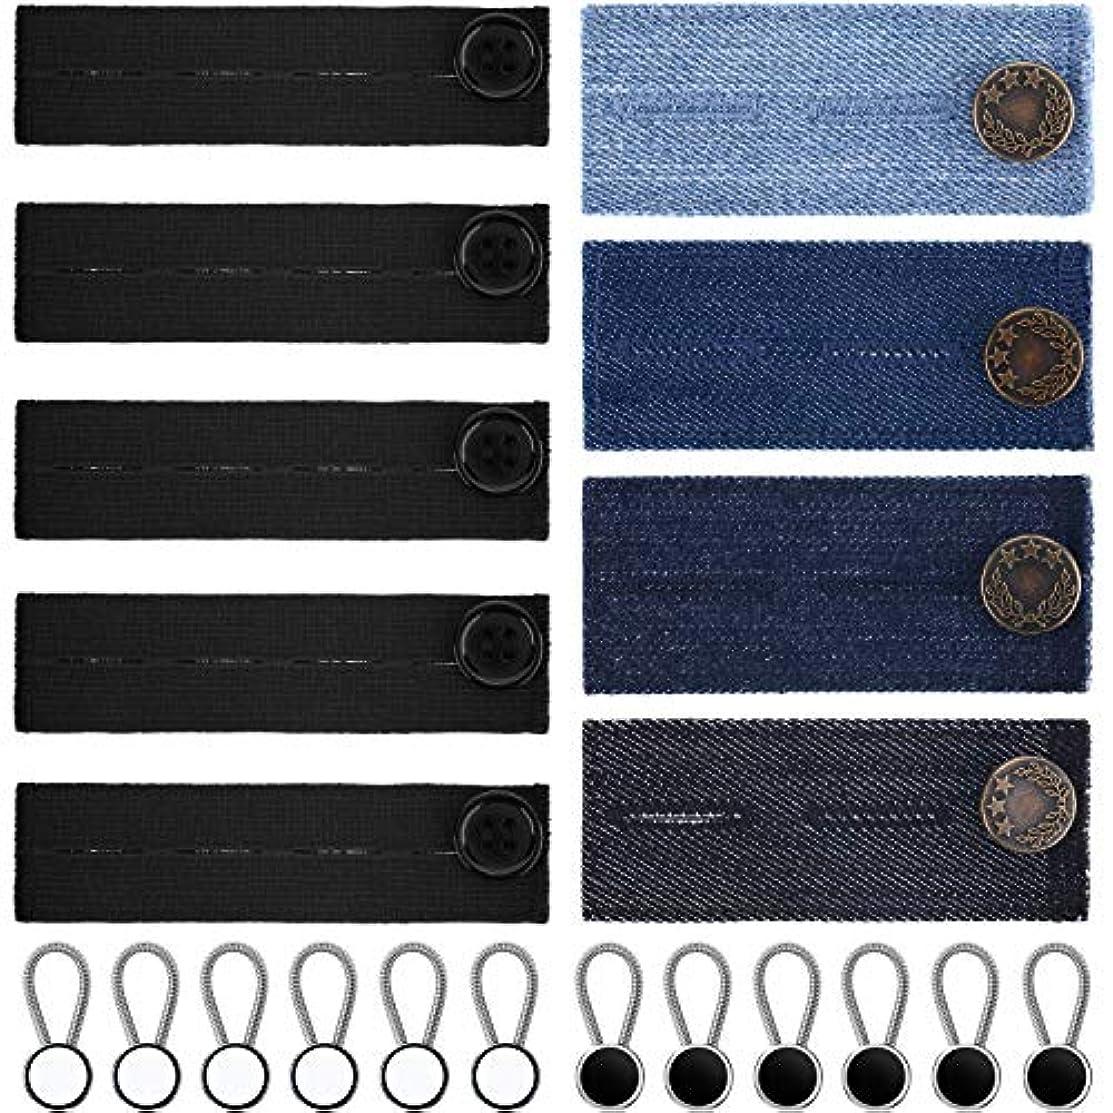 Skylety Waistband Extender Pants Waist Elastic Extenders Set, 3 Types for Jeans, Skirt, Trousers (Set 2, 19 Pieces)